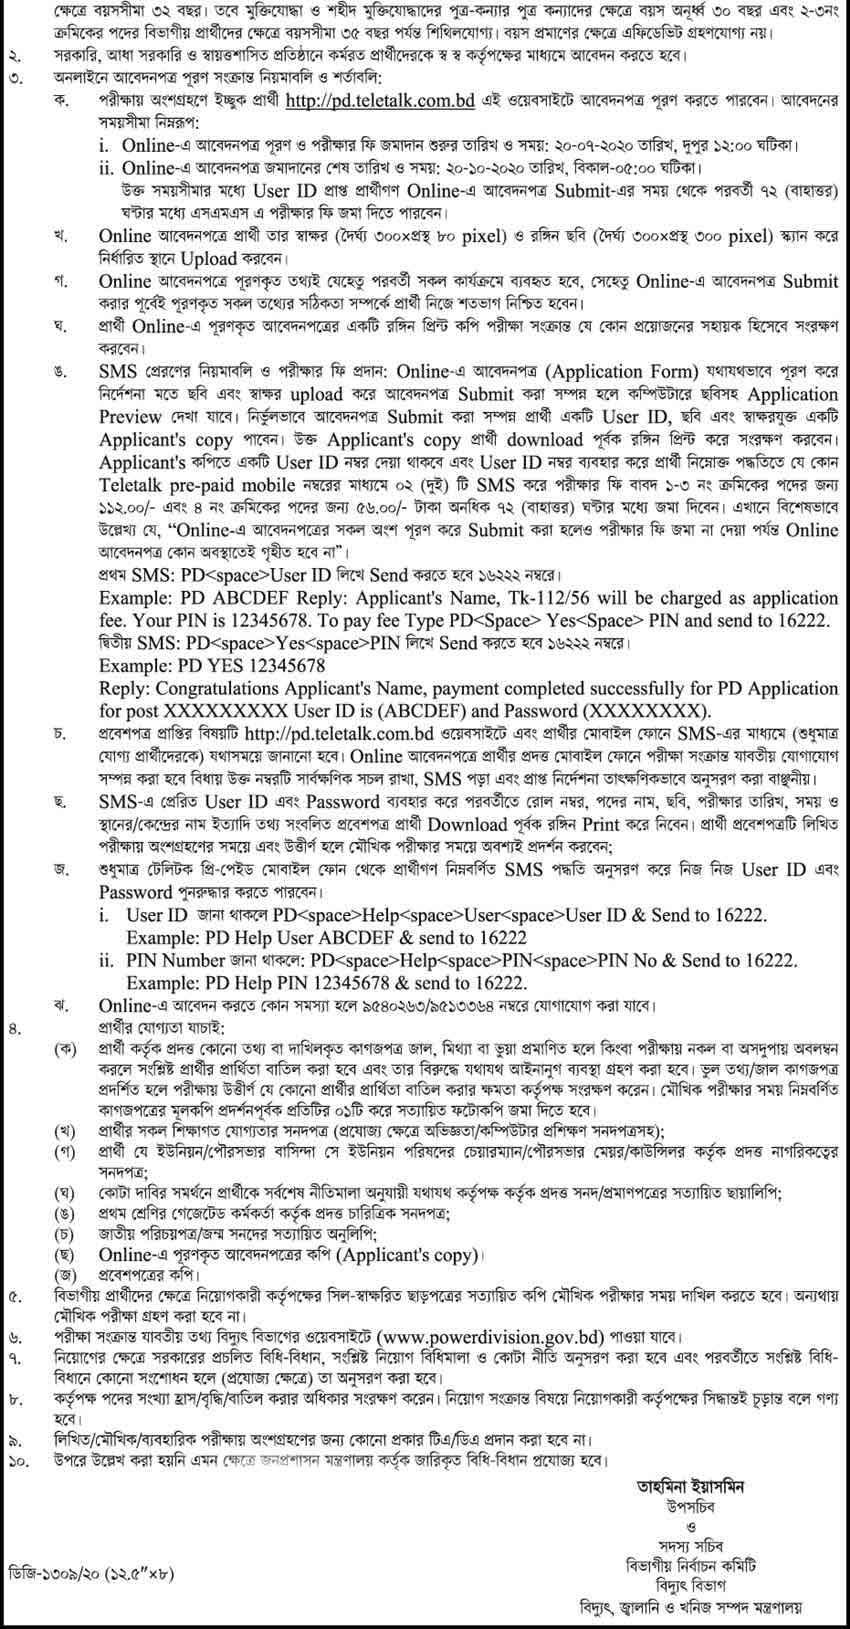 Power Division Job Circular 2020 | Govt Job Circular | Apply on pd.teletalk.com.bd 3